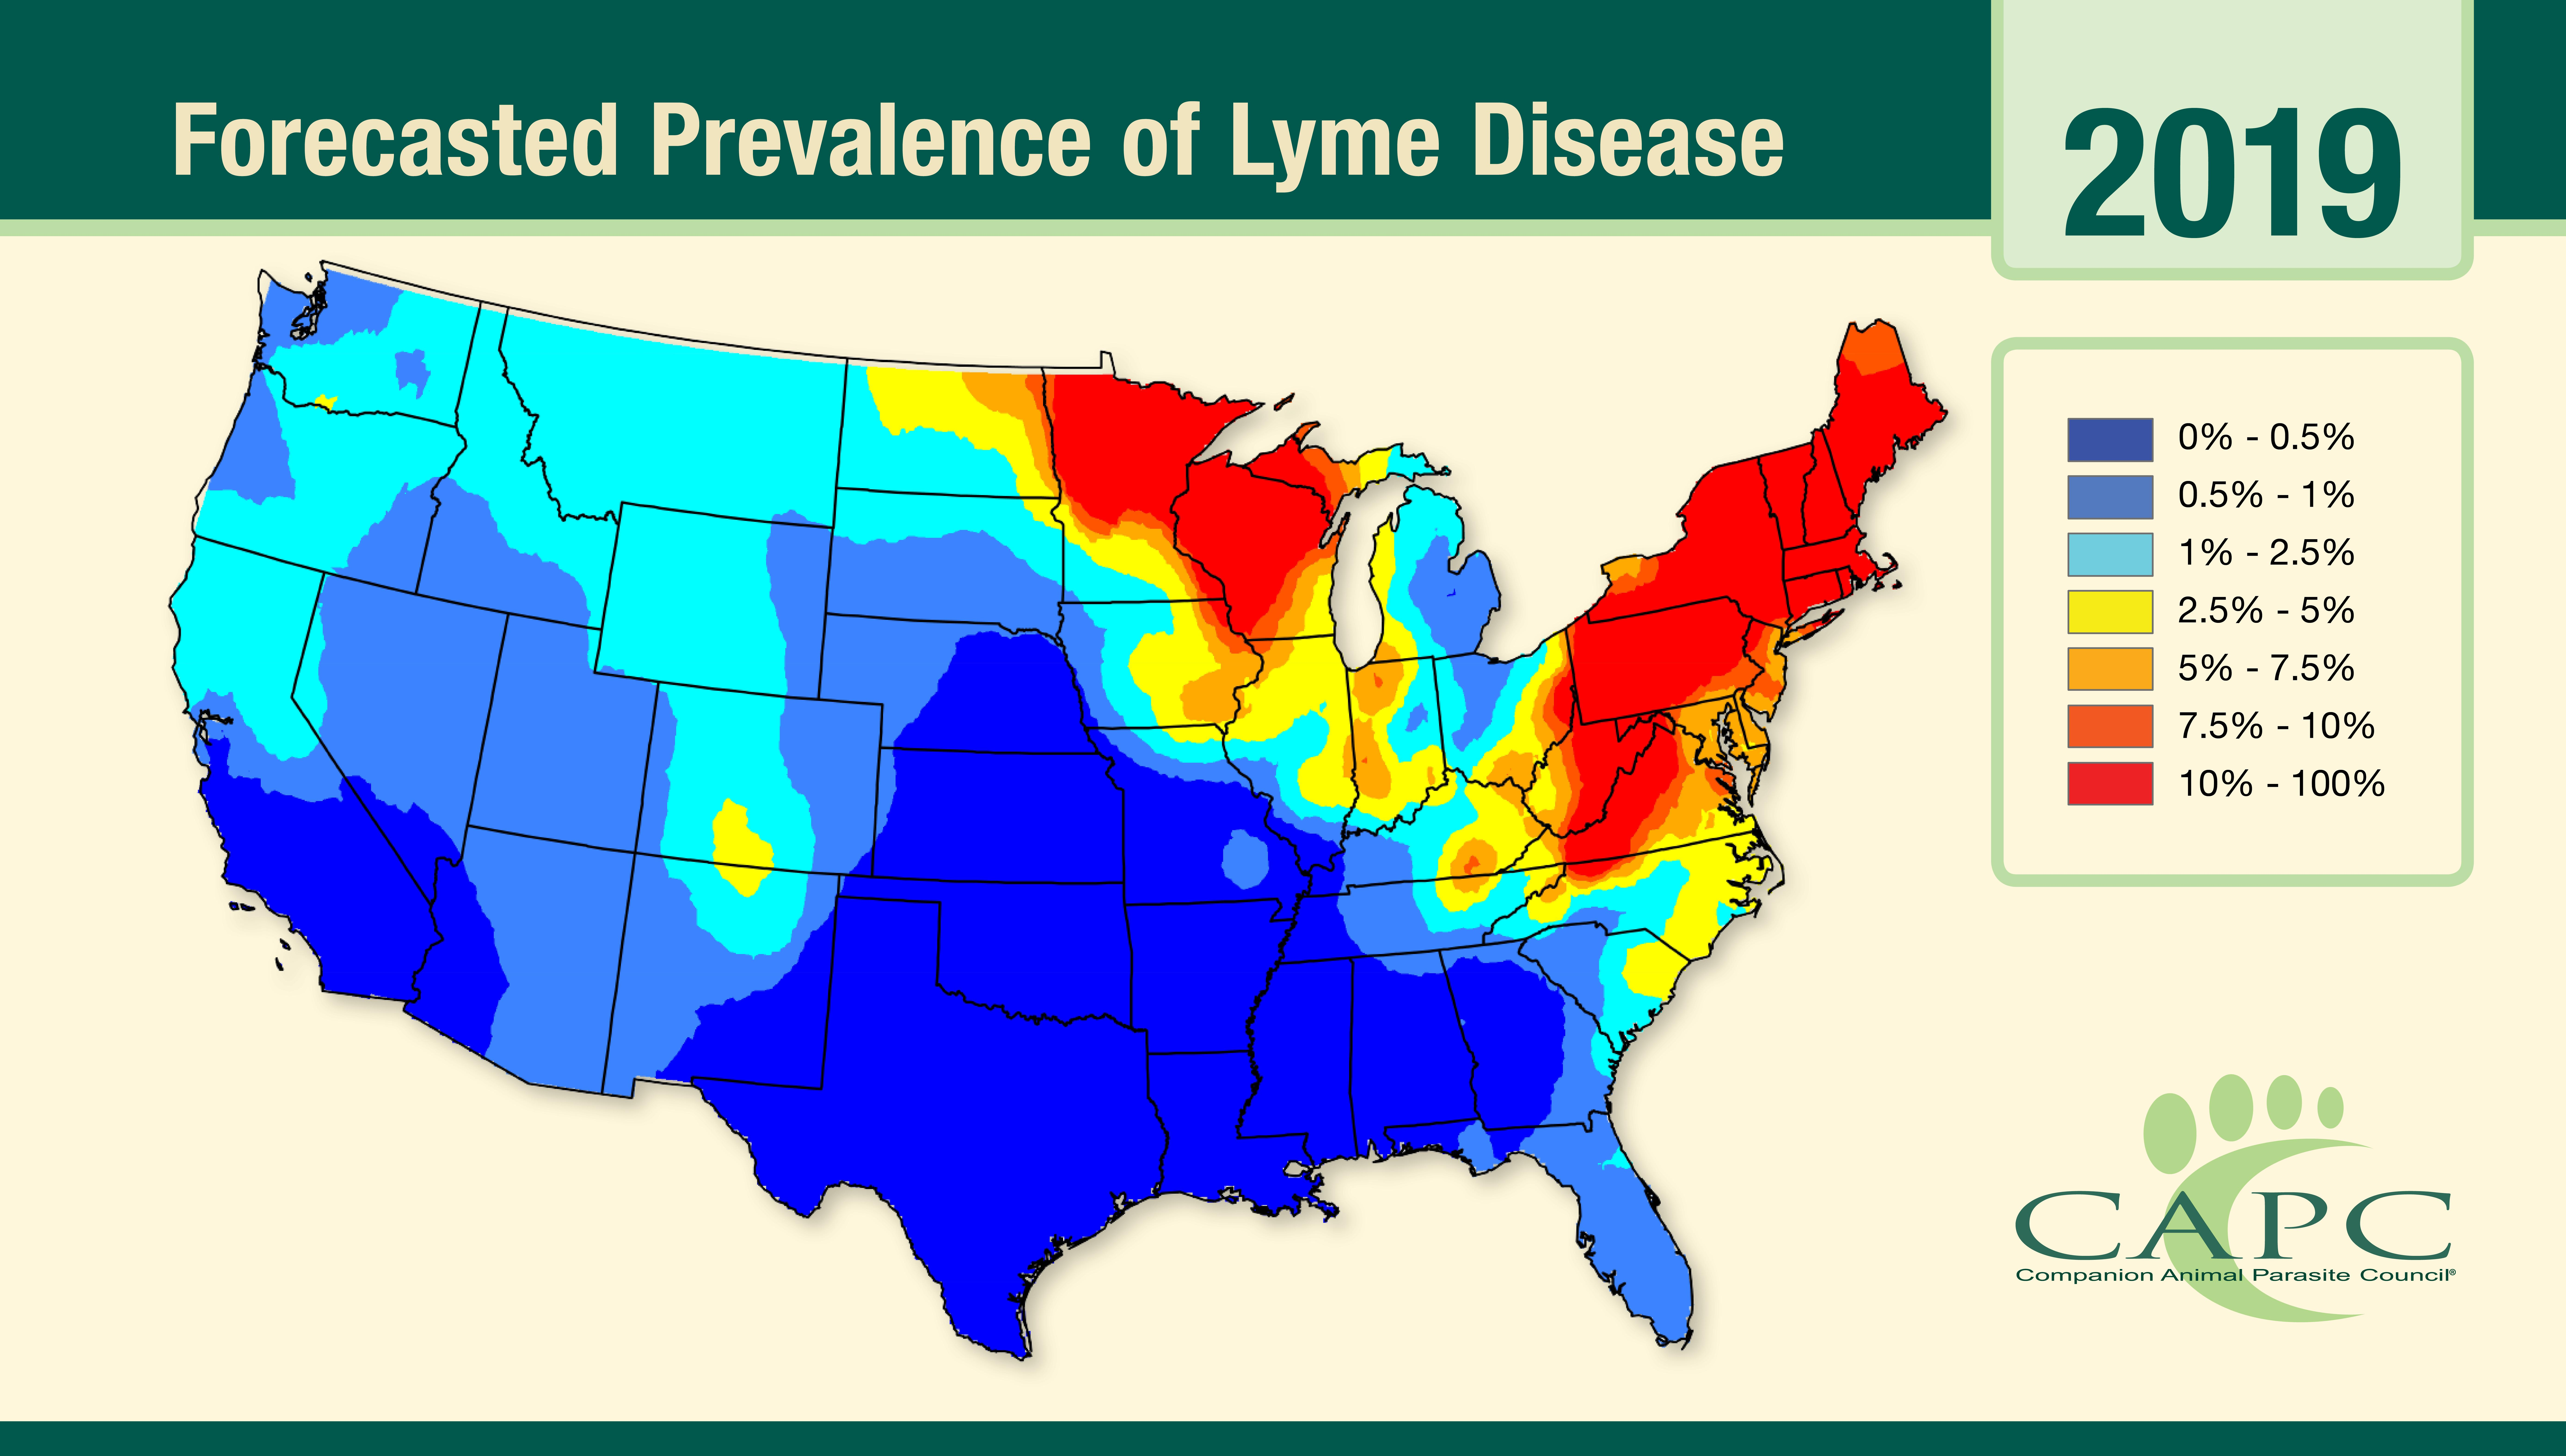 20190402 Capc Forecast Maps Display Lyme